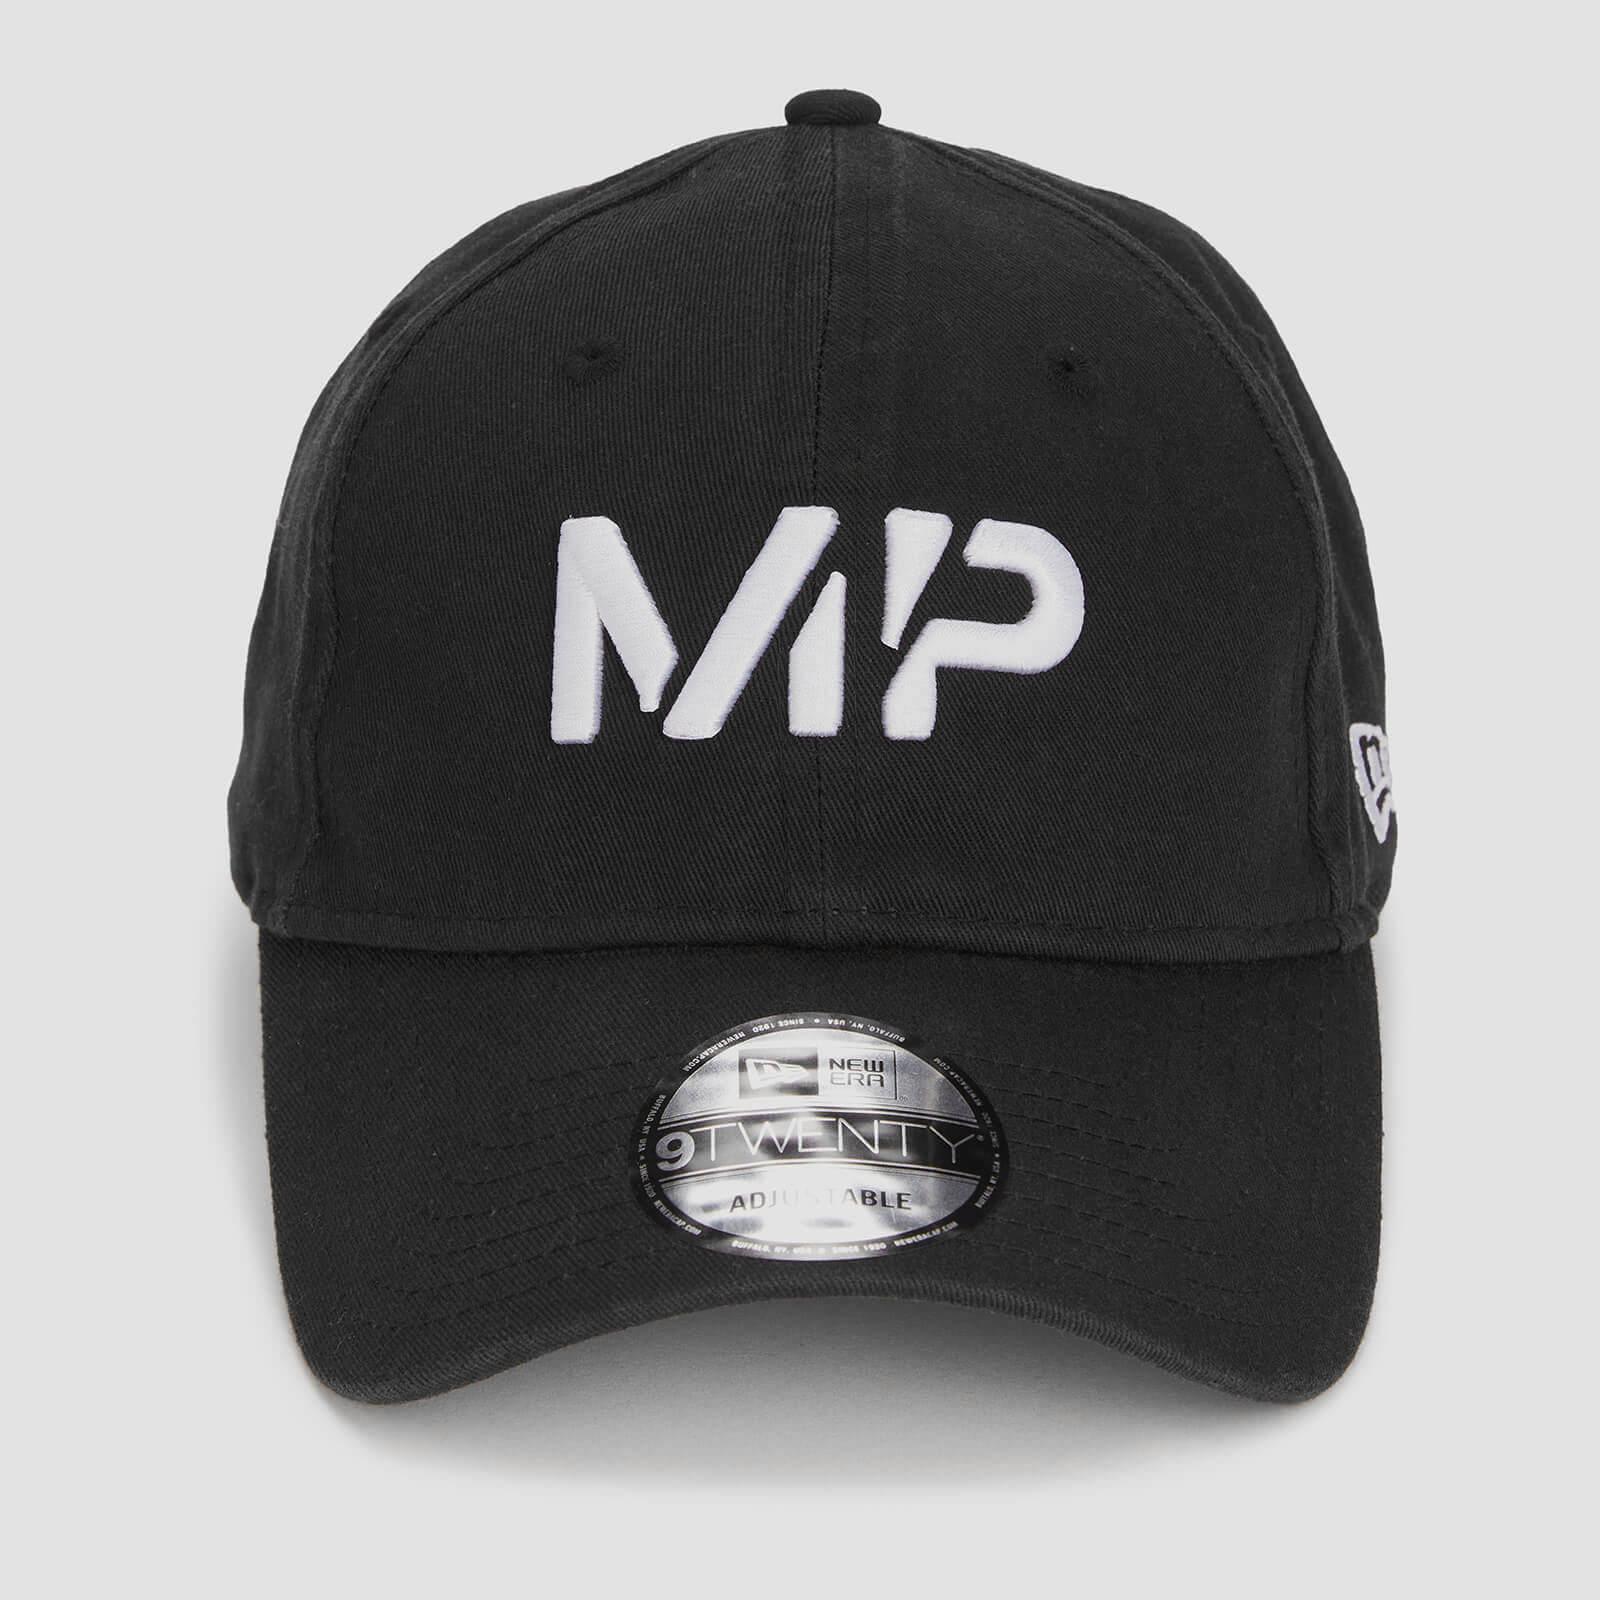 MP New Era 9TWENTY Baseball Cap - Black/White